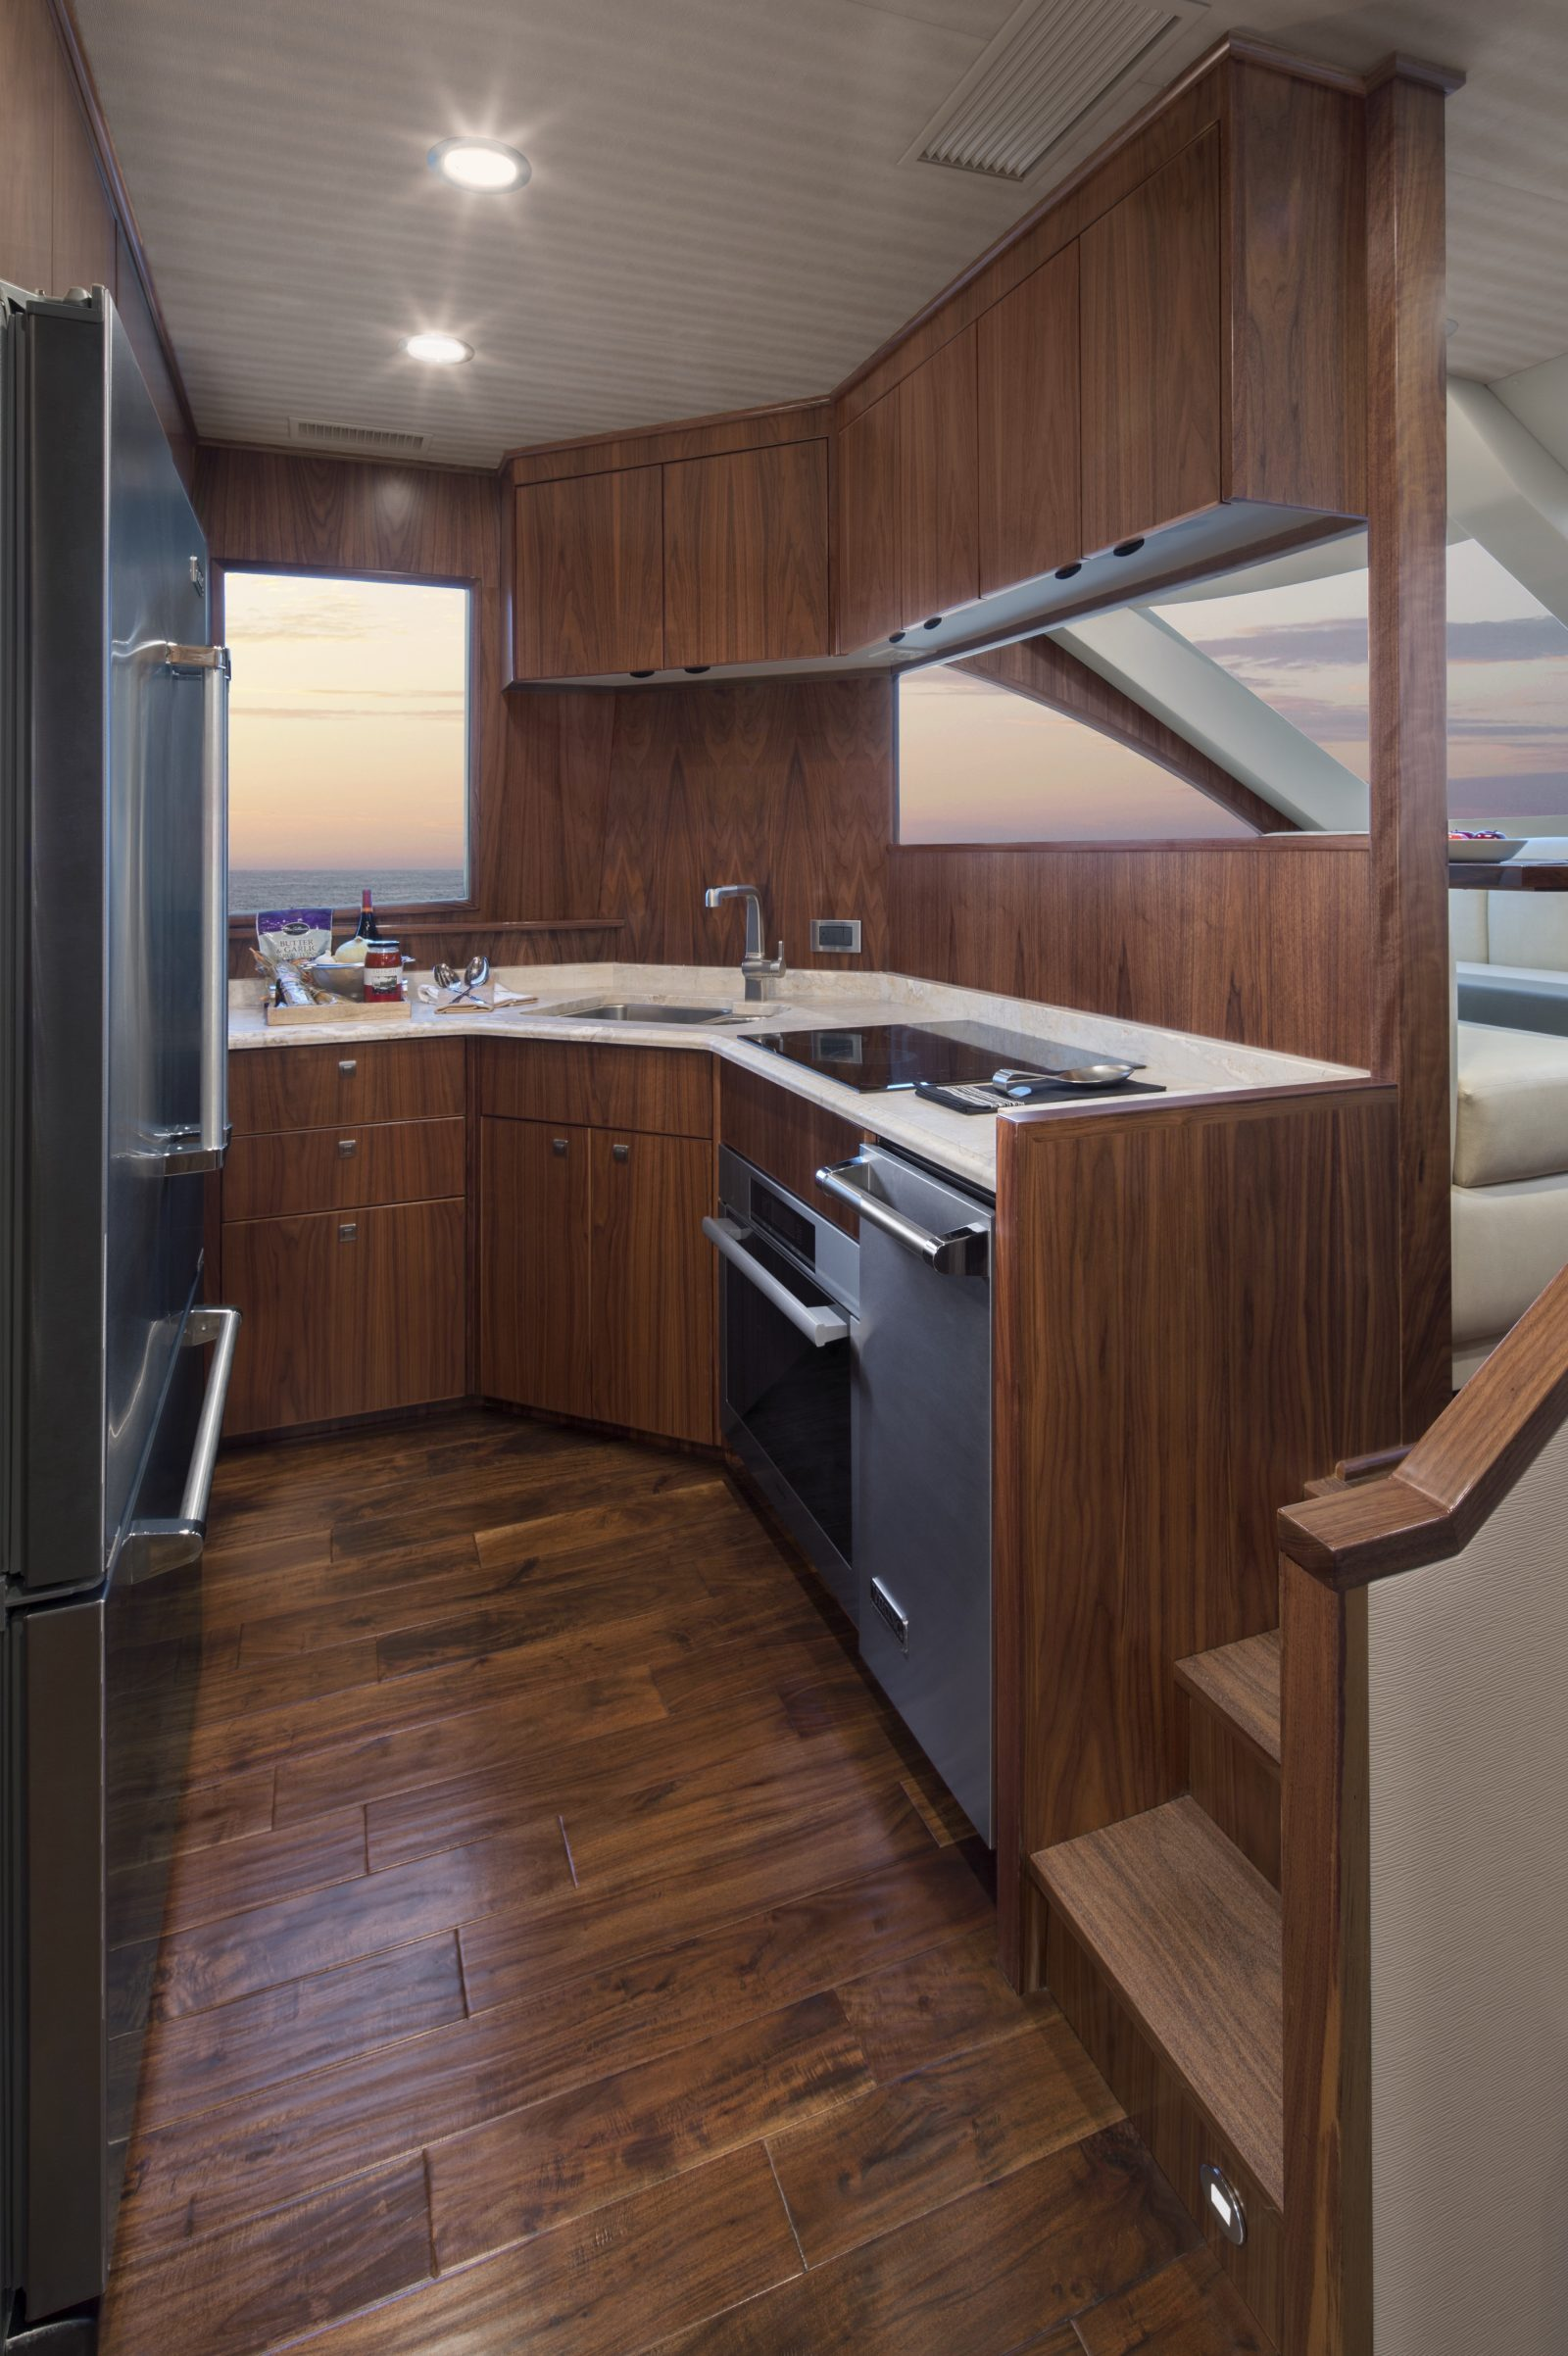 75my19 | 75 Motor Yacht